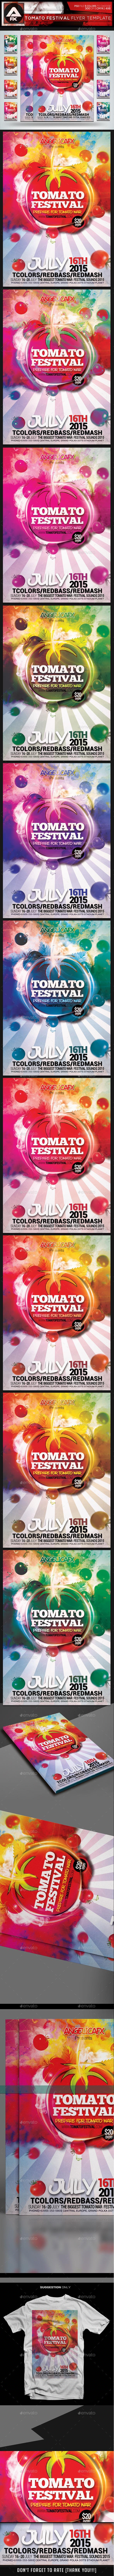 Tomato Festival - Flyers Print Templates